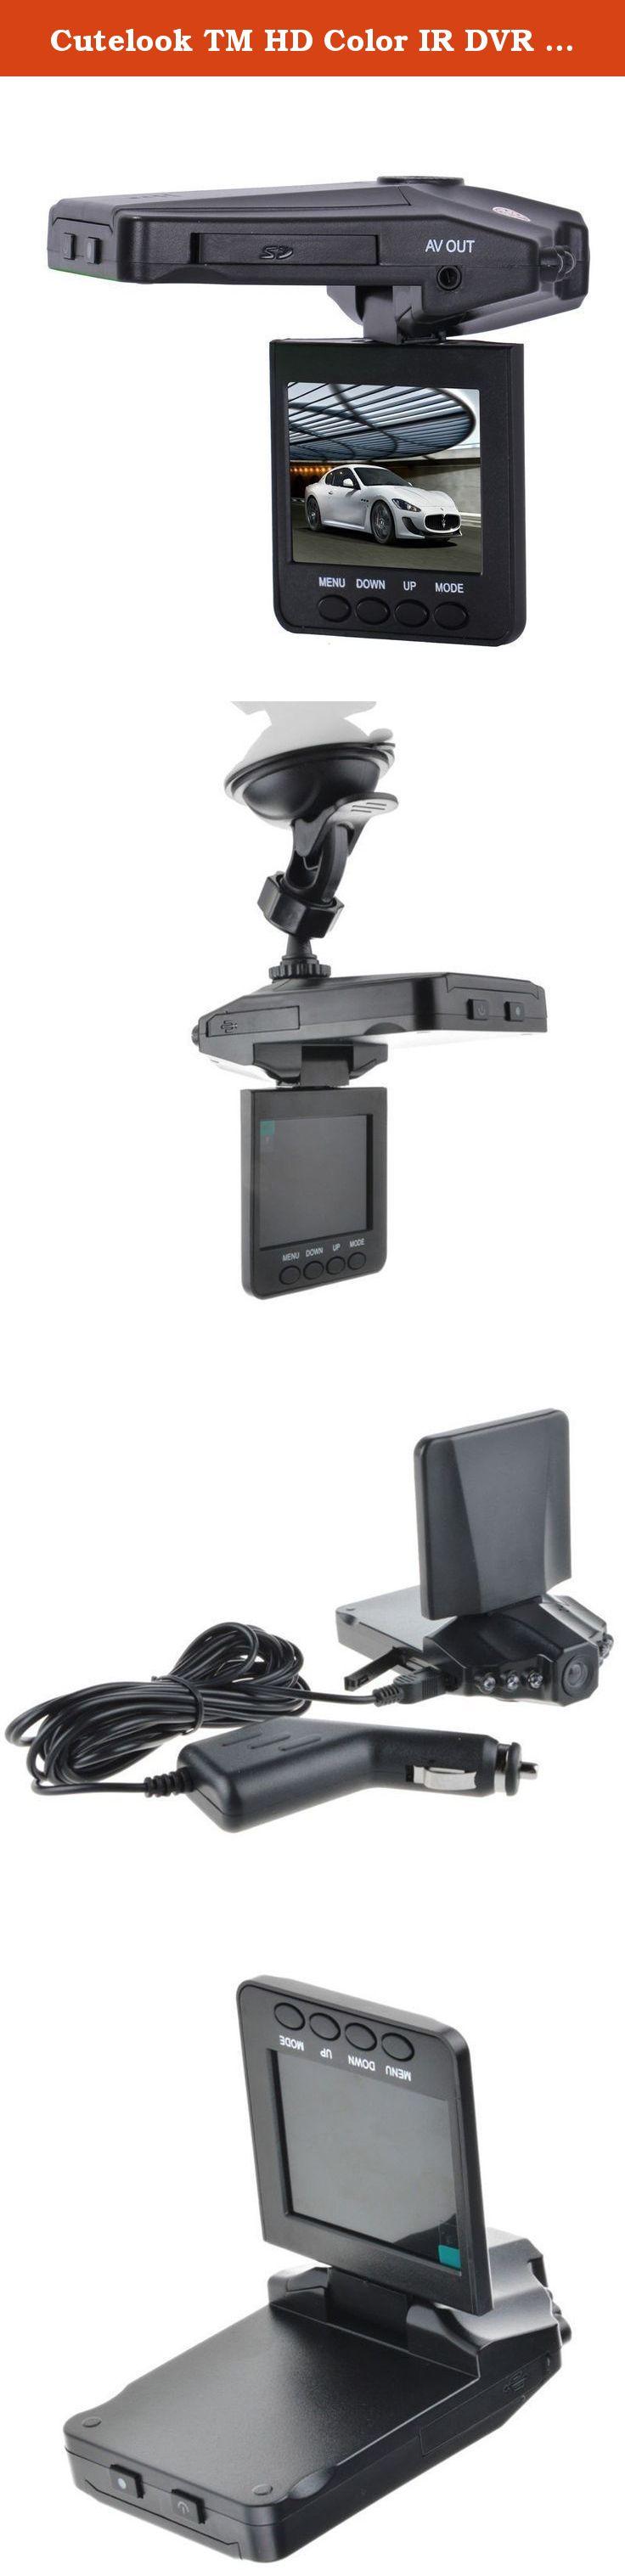 Cutelook TM HD Color IR DVR NightVision Car Dash Camera 2